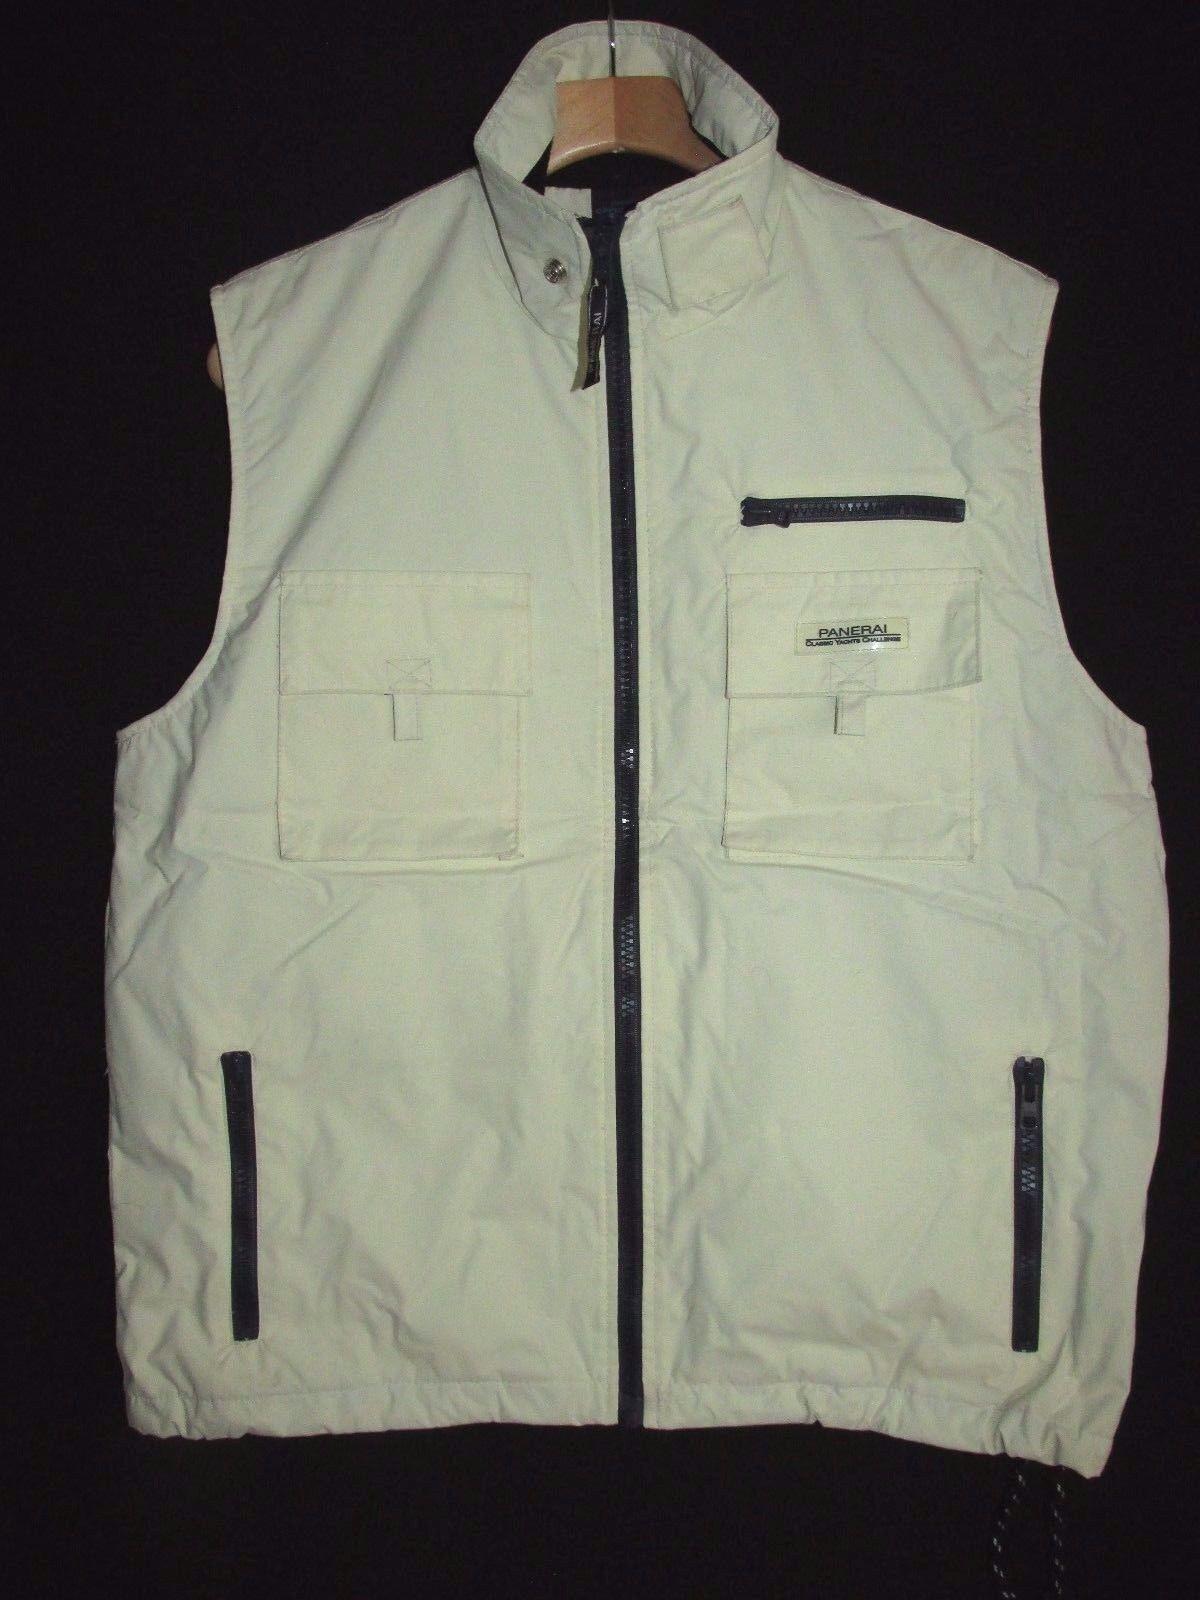 Panerai Authentic Waterproof Water Sport Vest, Women's Large Authentic  M1A